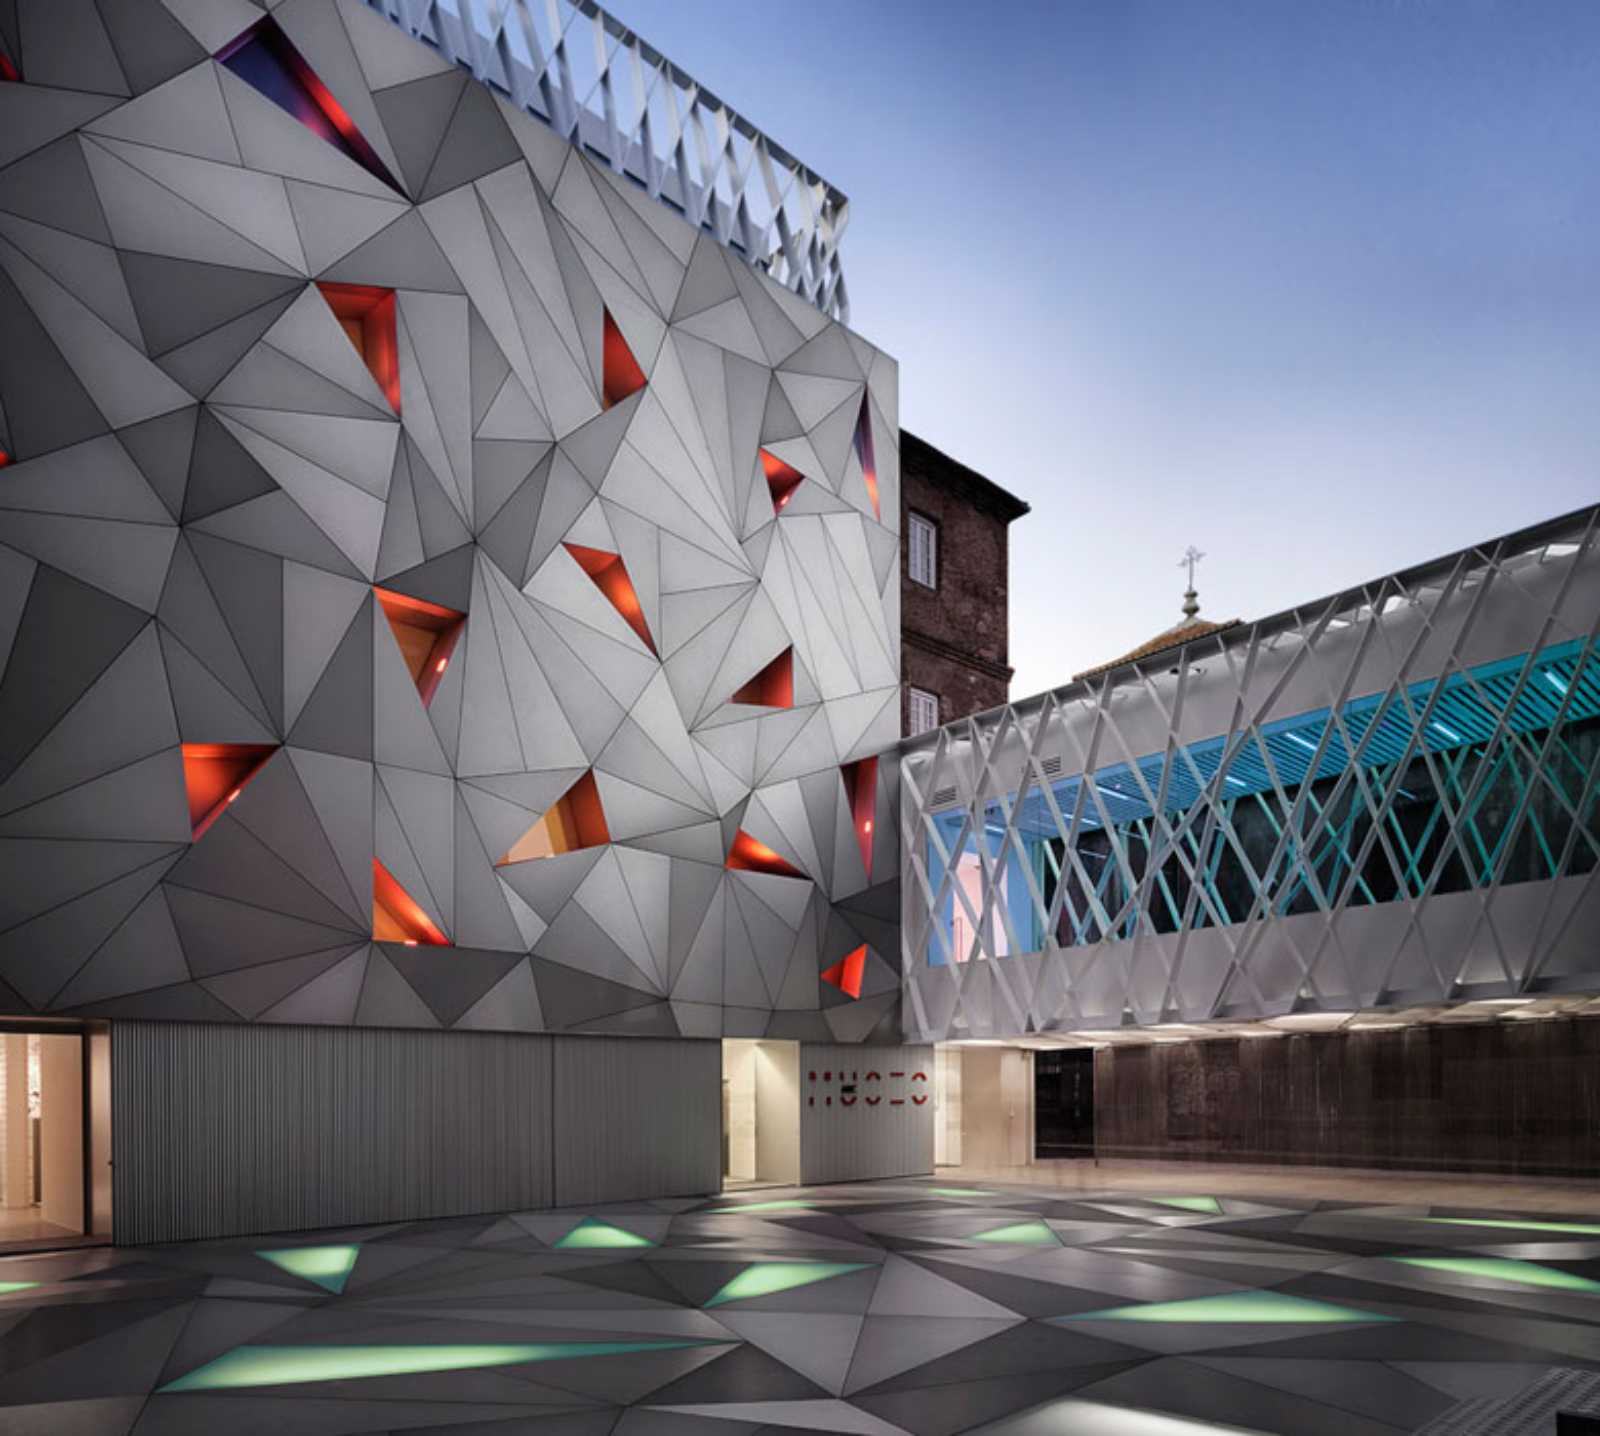 Arquinotas abc madrid museo de aranguren y arquitectos - Arquitectos en espana ...